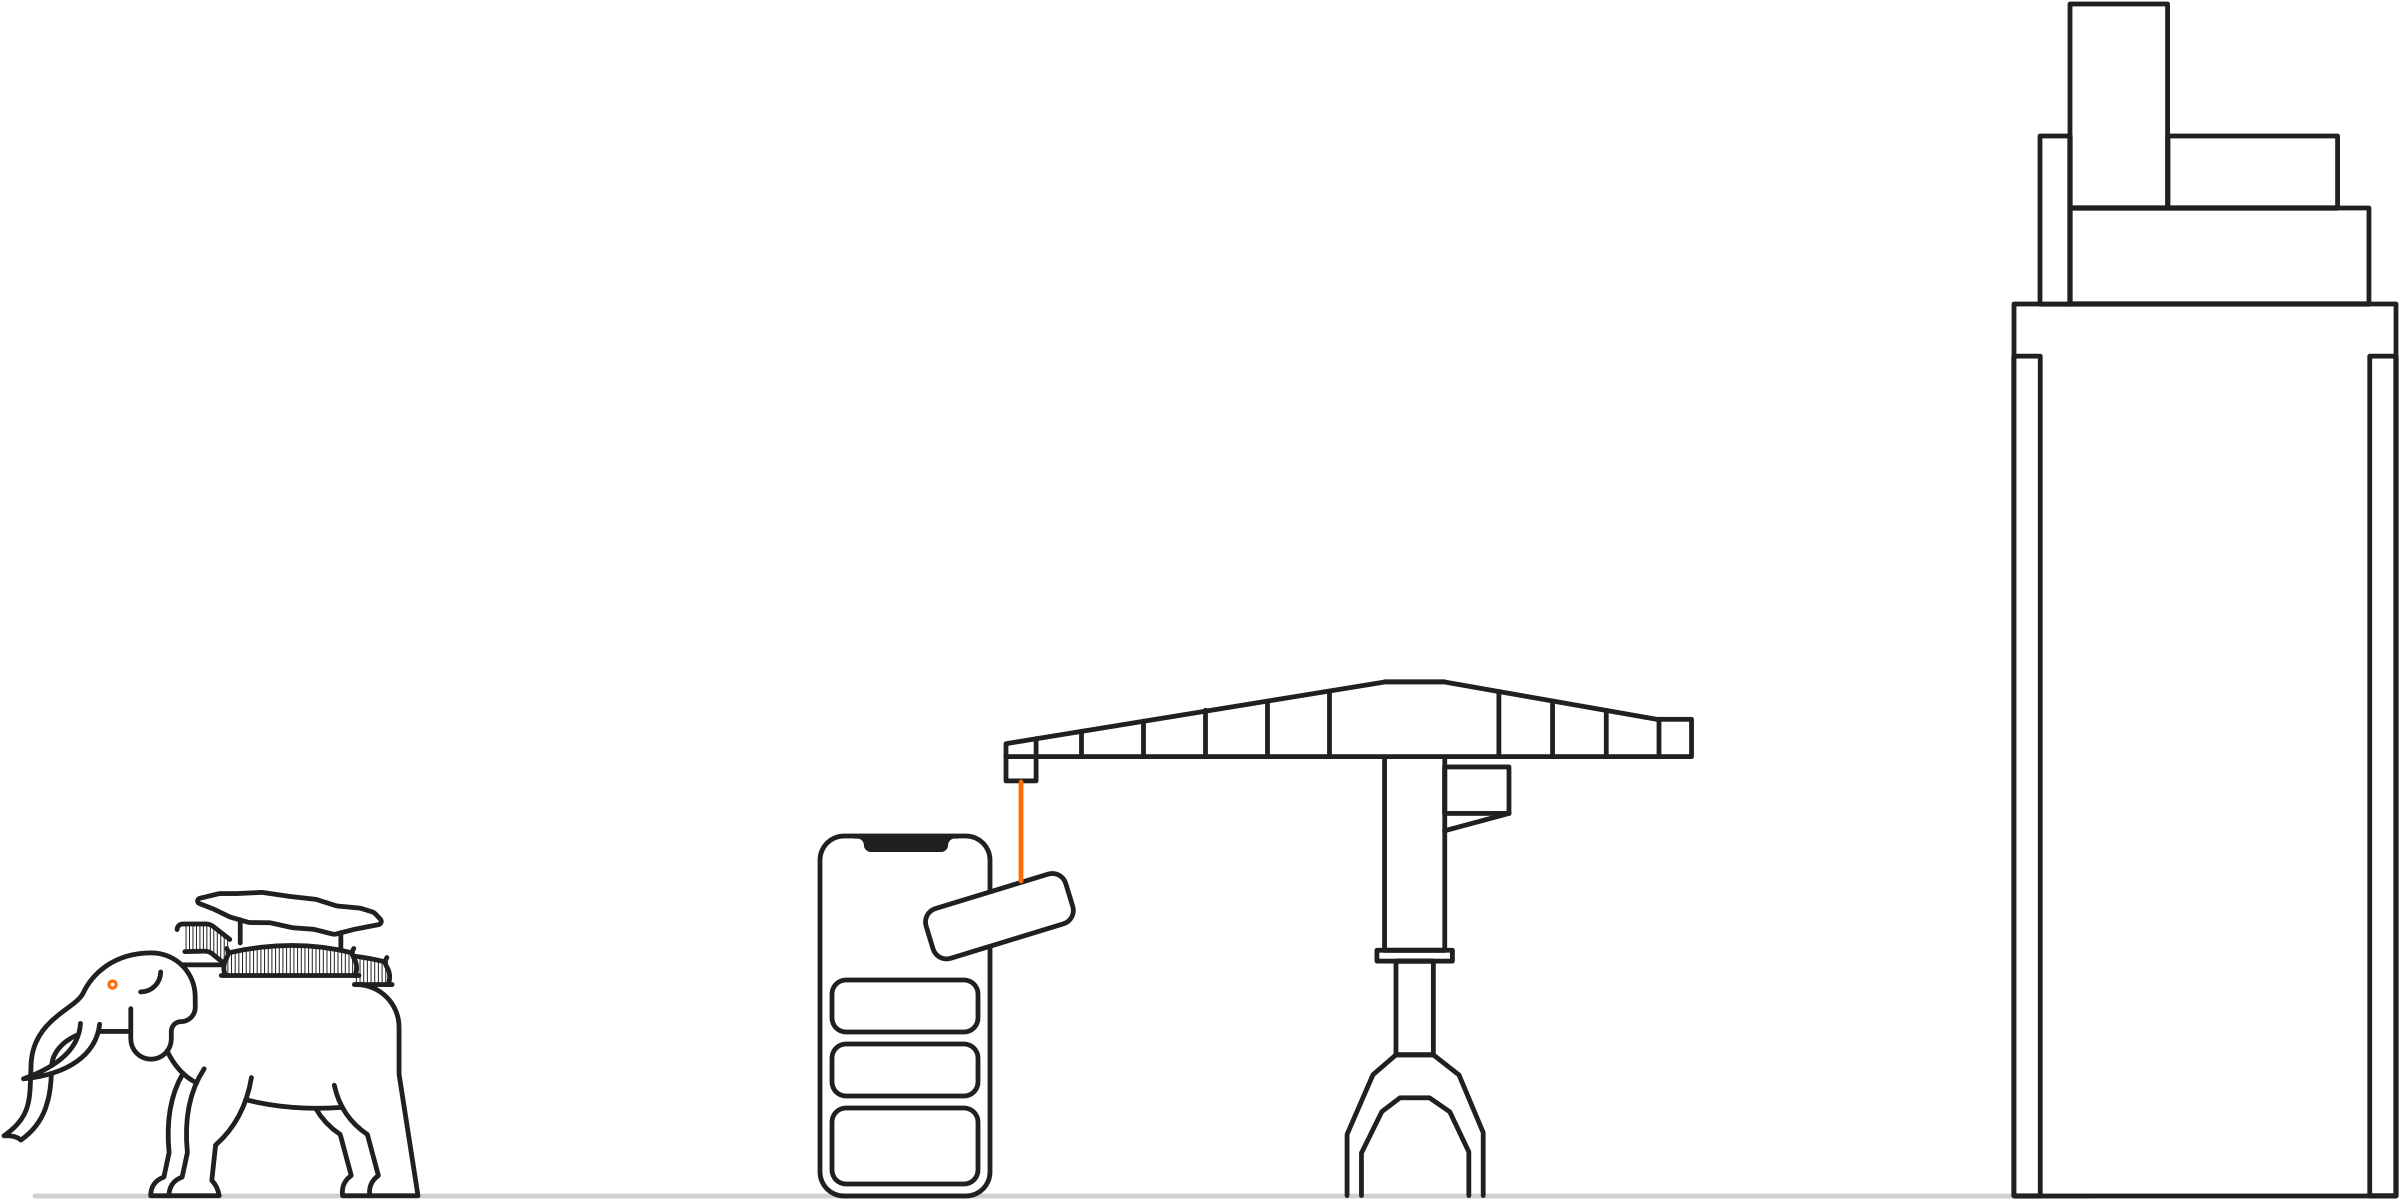 ripplemotion-illustration-home-développement-projet